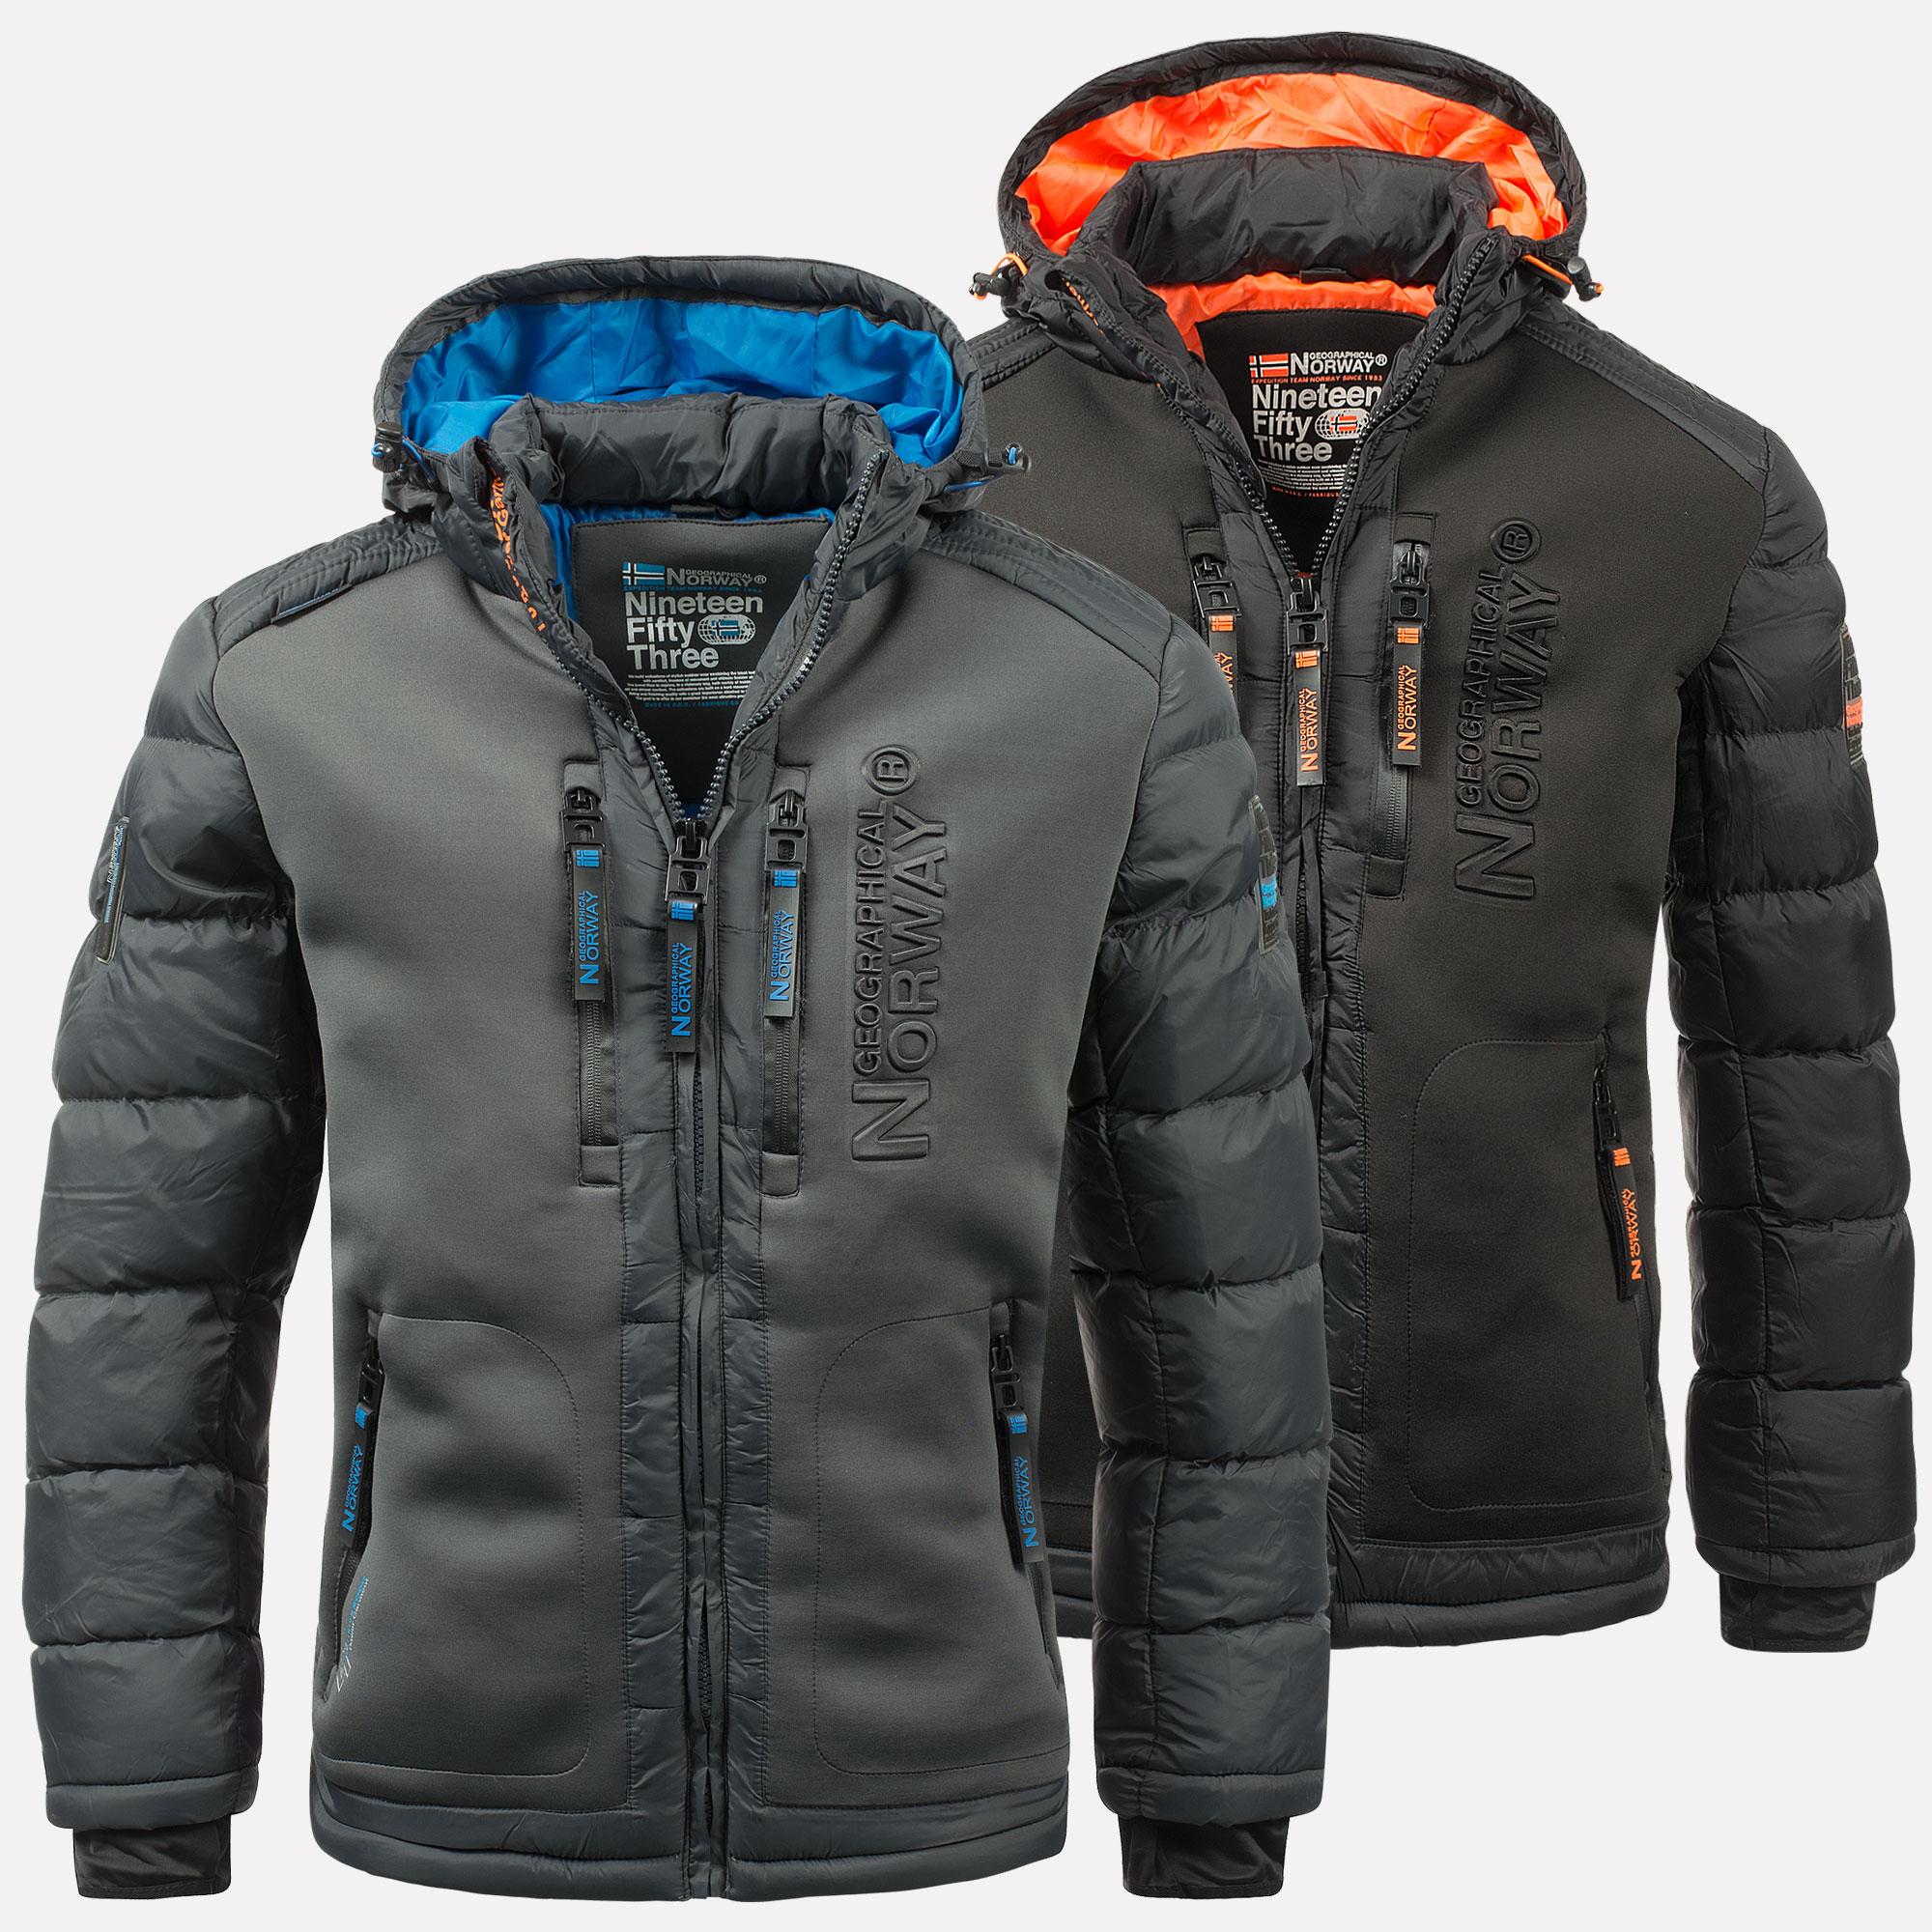 Geographical Norway warme Designer Herren Winter Stepp Jacke